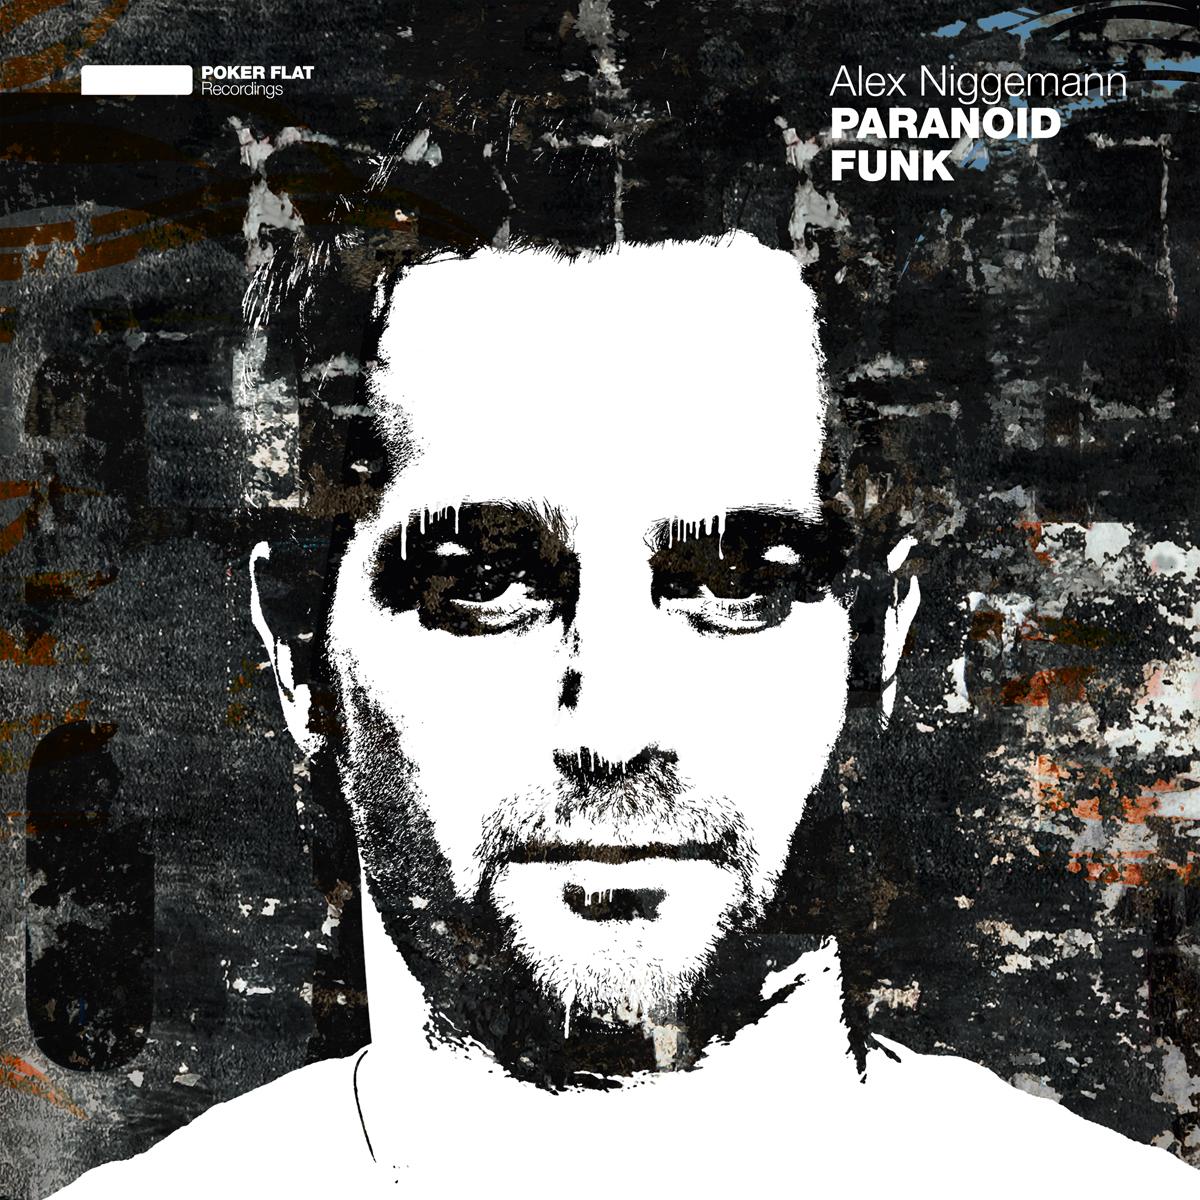 Alex Niggemann – Paranoid Funk (Poker Flat)